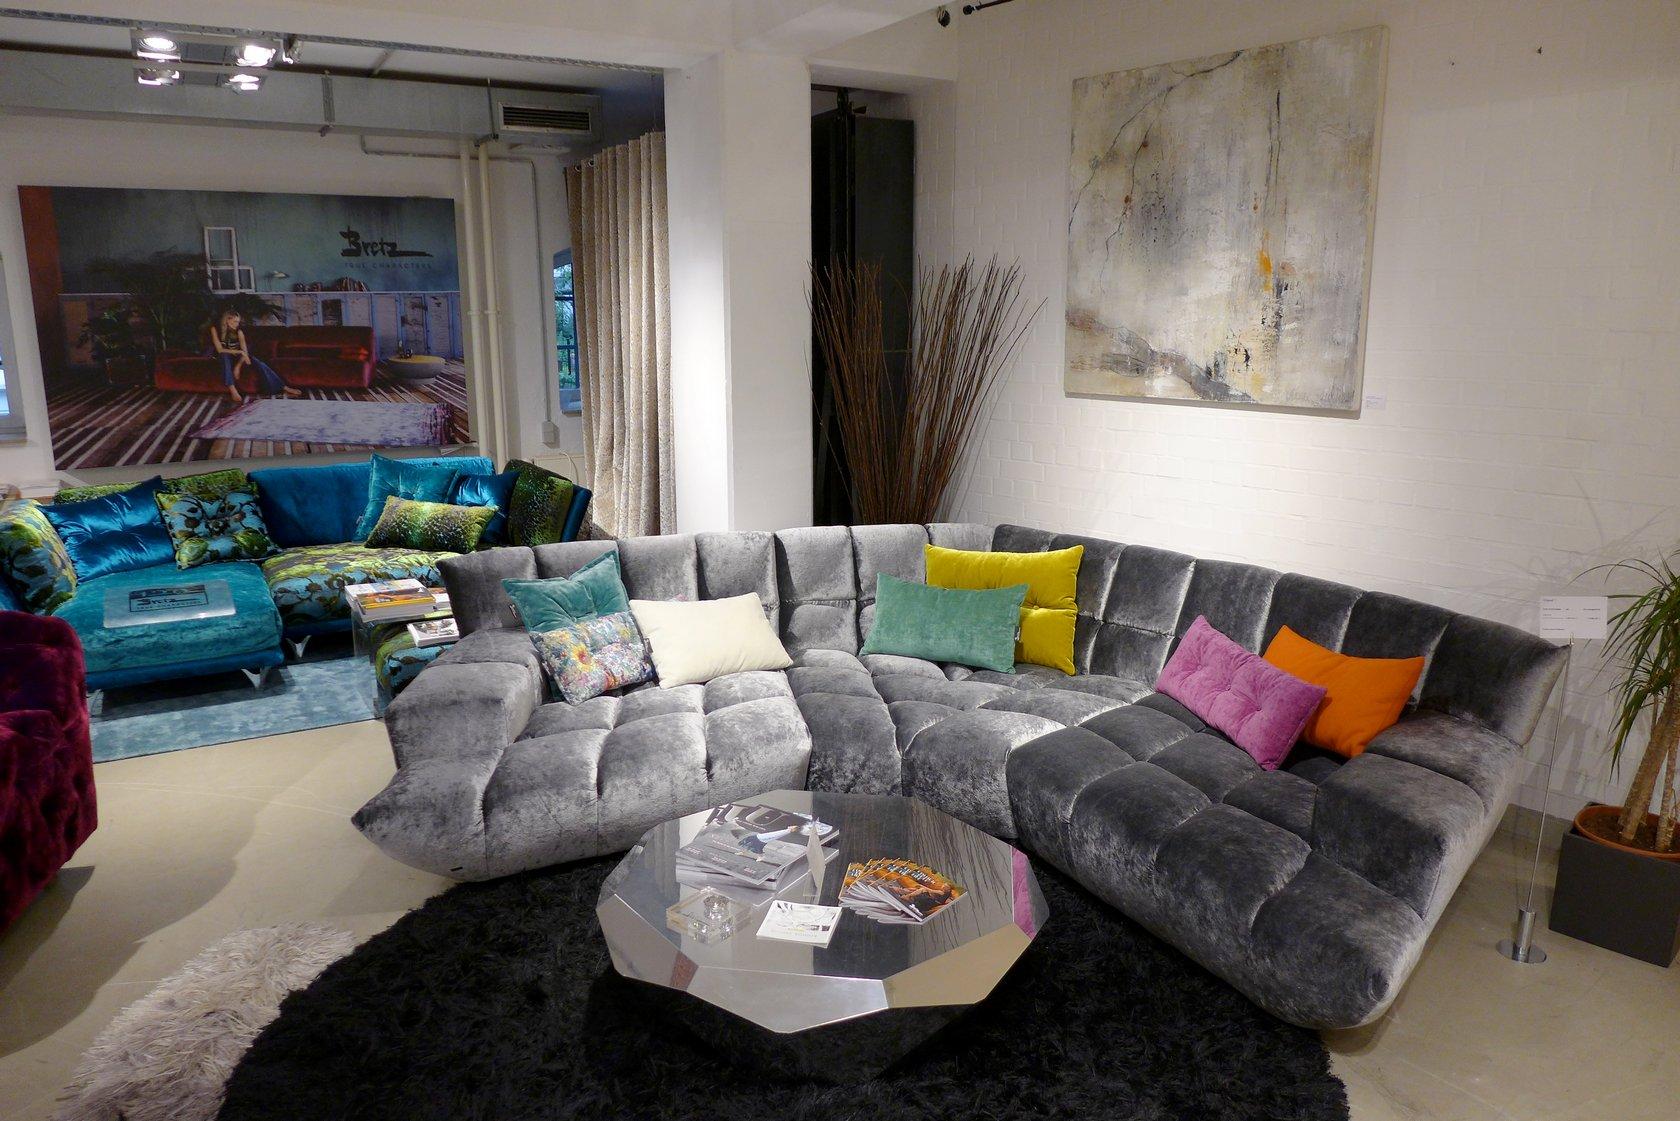 bretz flagship store hamburg stilwerk 2017 06 13 006 bretz store hamburg. Black Bedroom Furniture Sets. Home Design Ideas